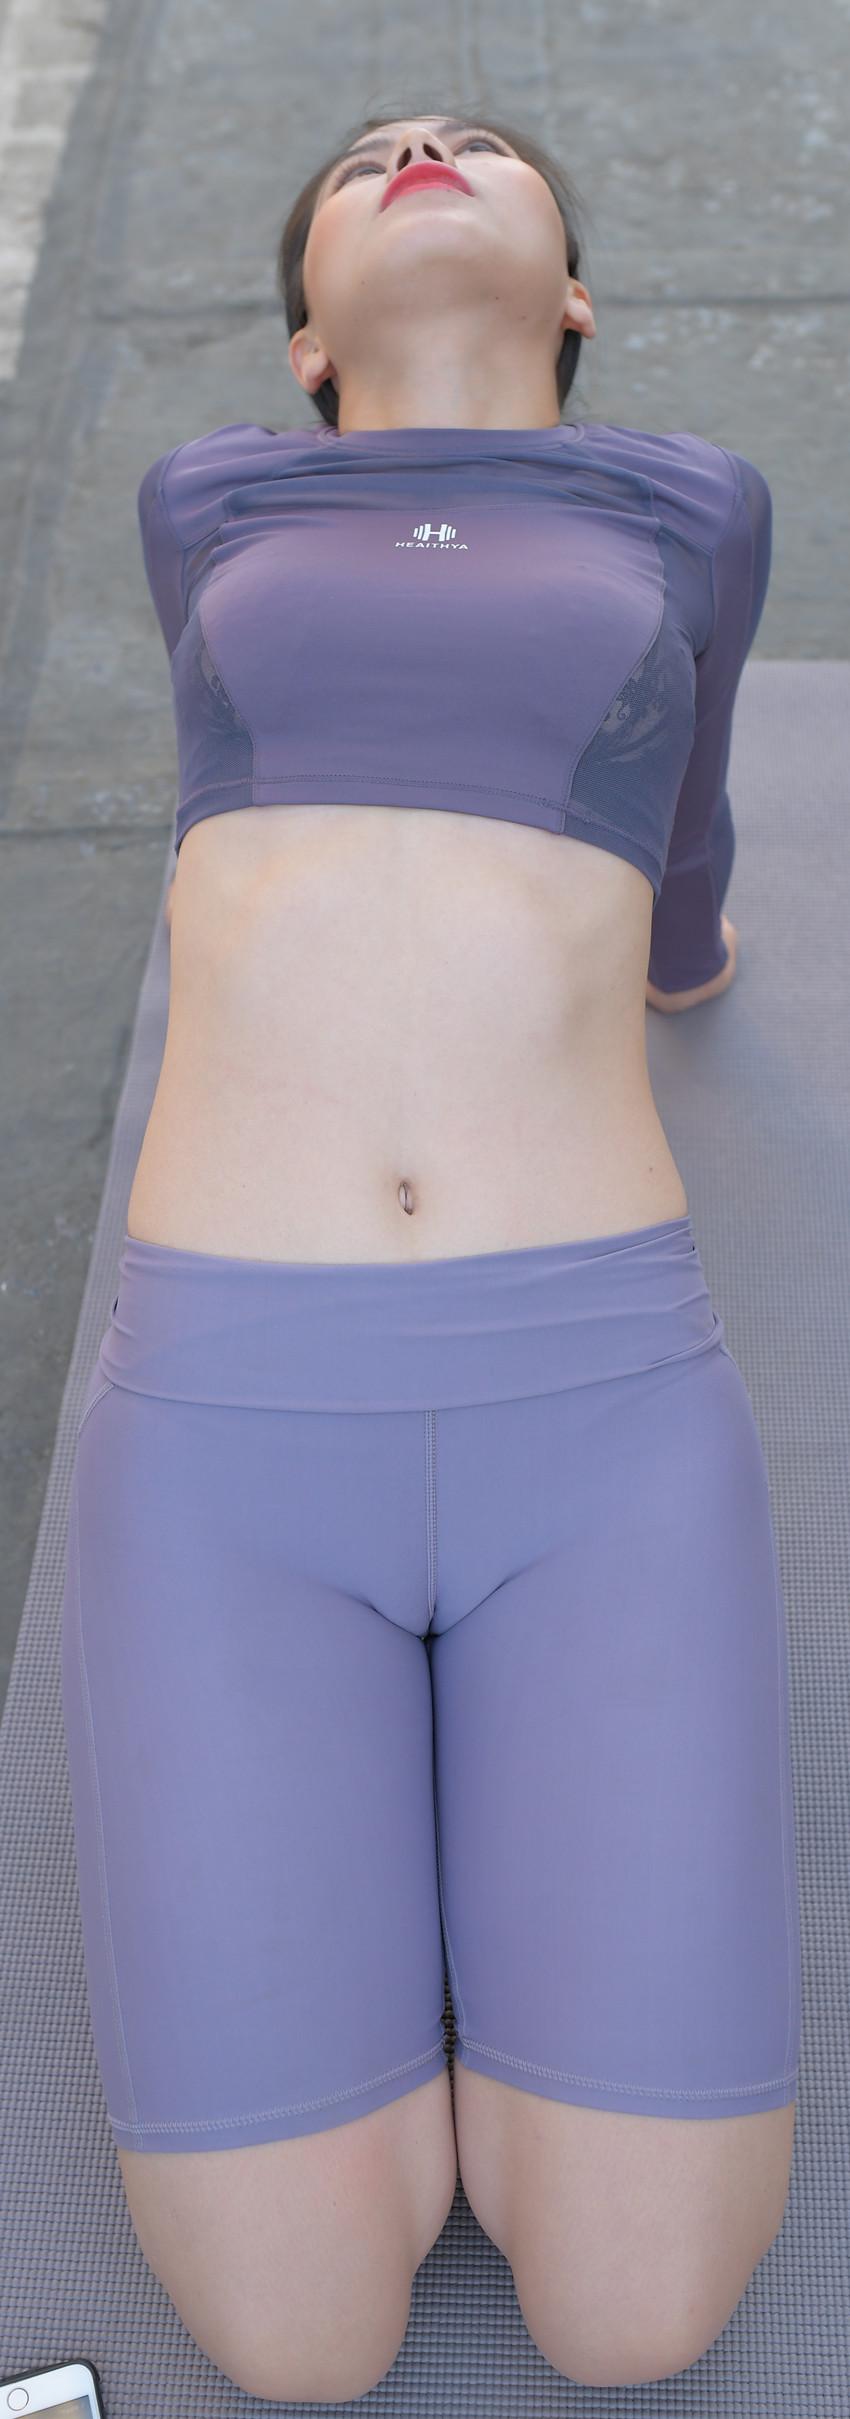 瑜伽短裤套装